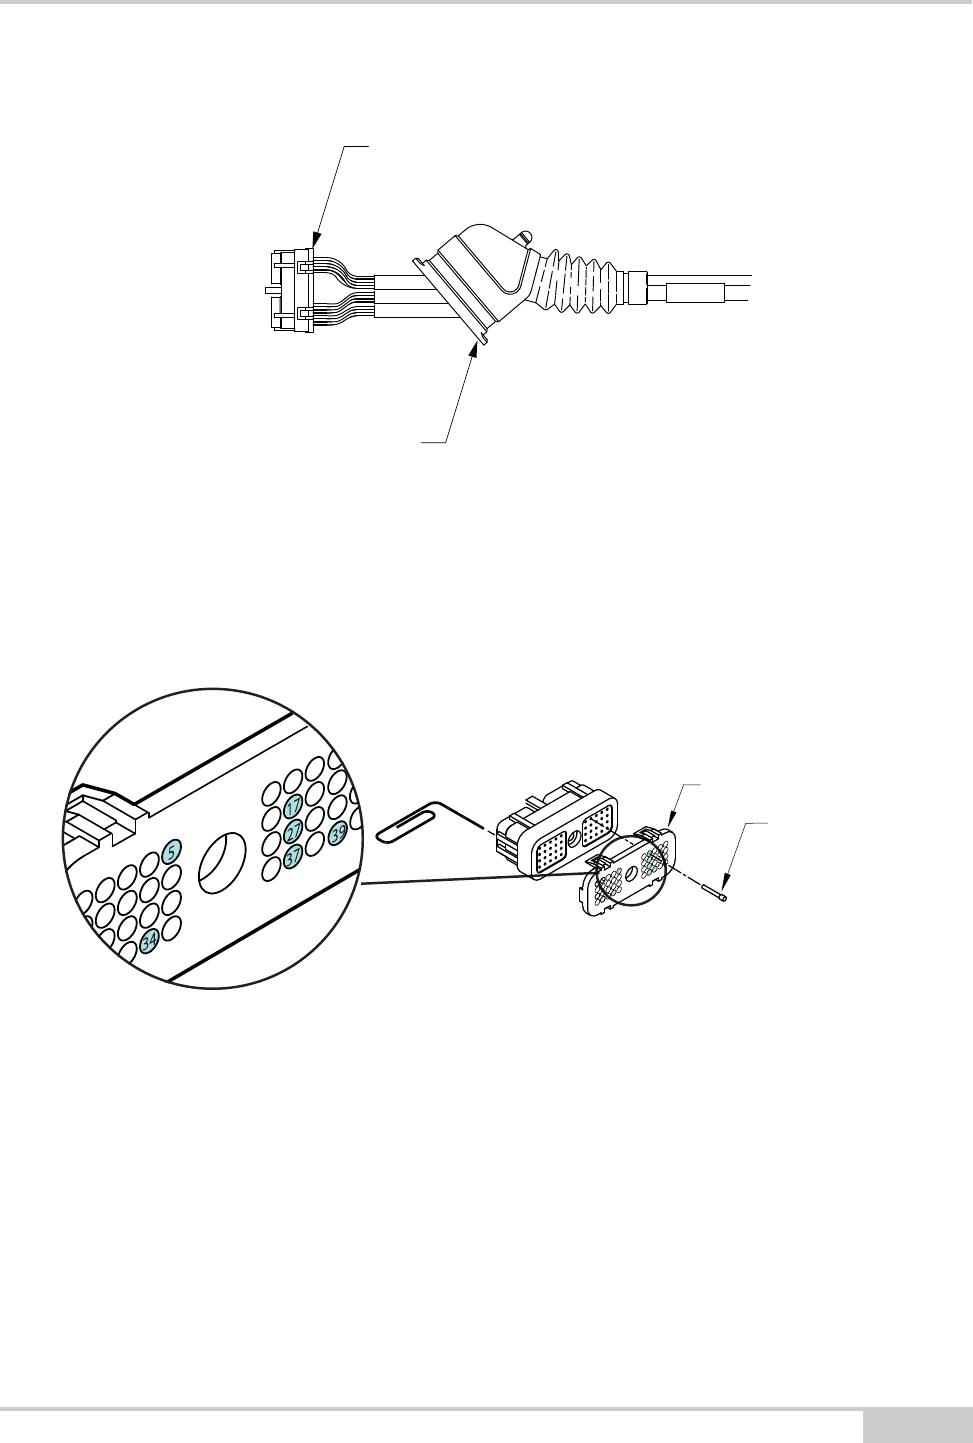 Topcon Positioning Systems SL-100 SL-100 User Manual SL 100 IM